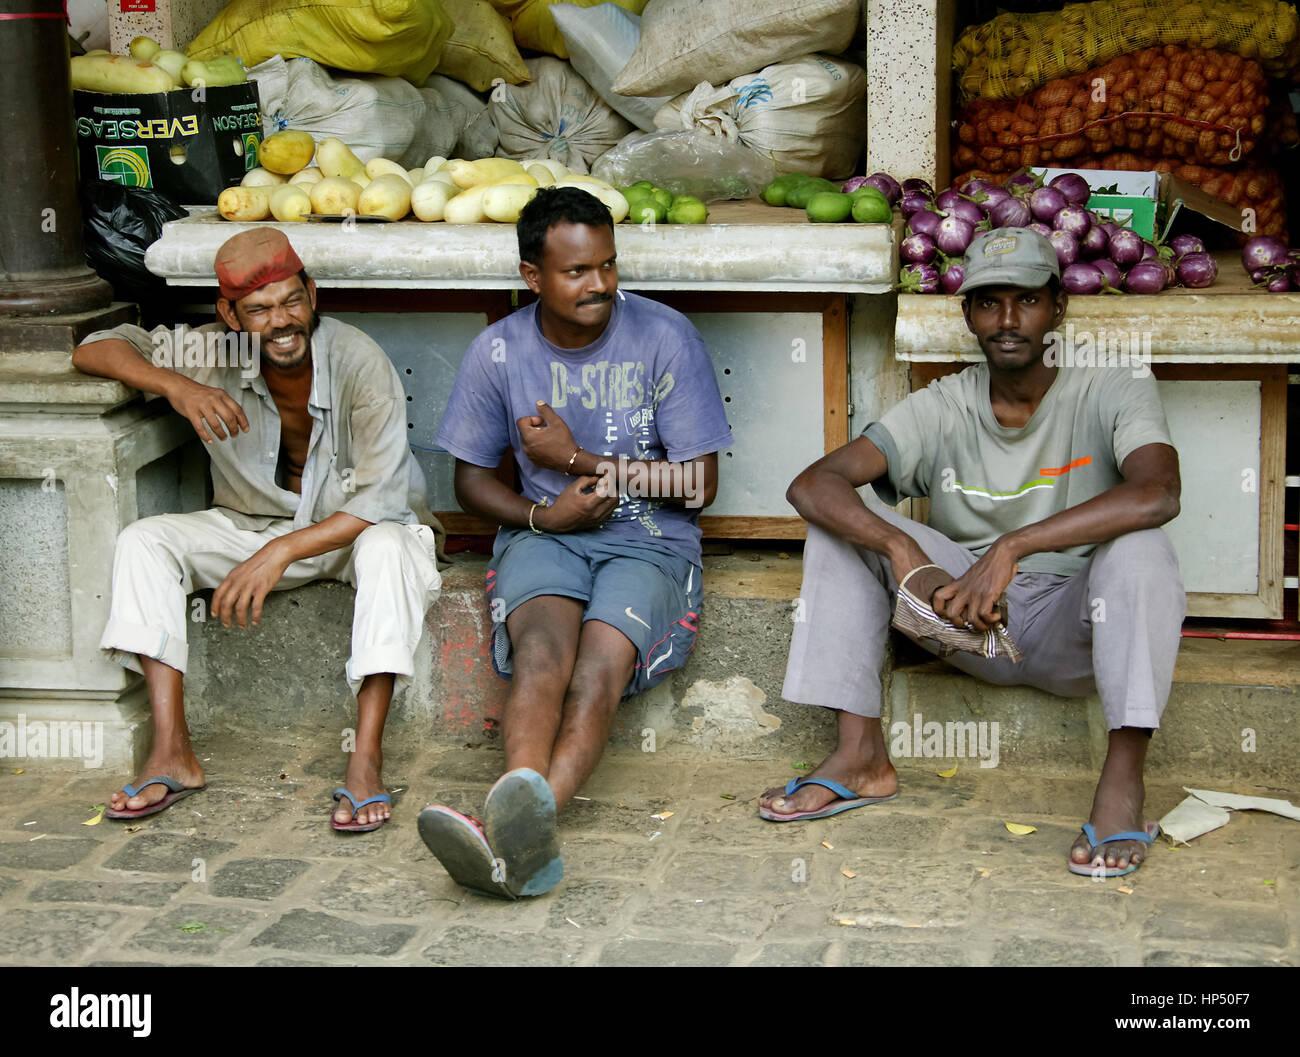 Port Louis, street scene, street scene, street vendor in the market, potatoes, onions, - Stock Image